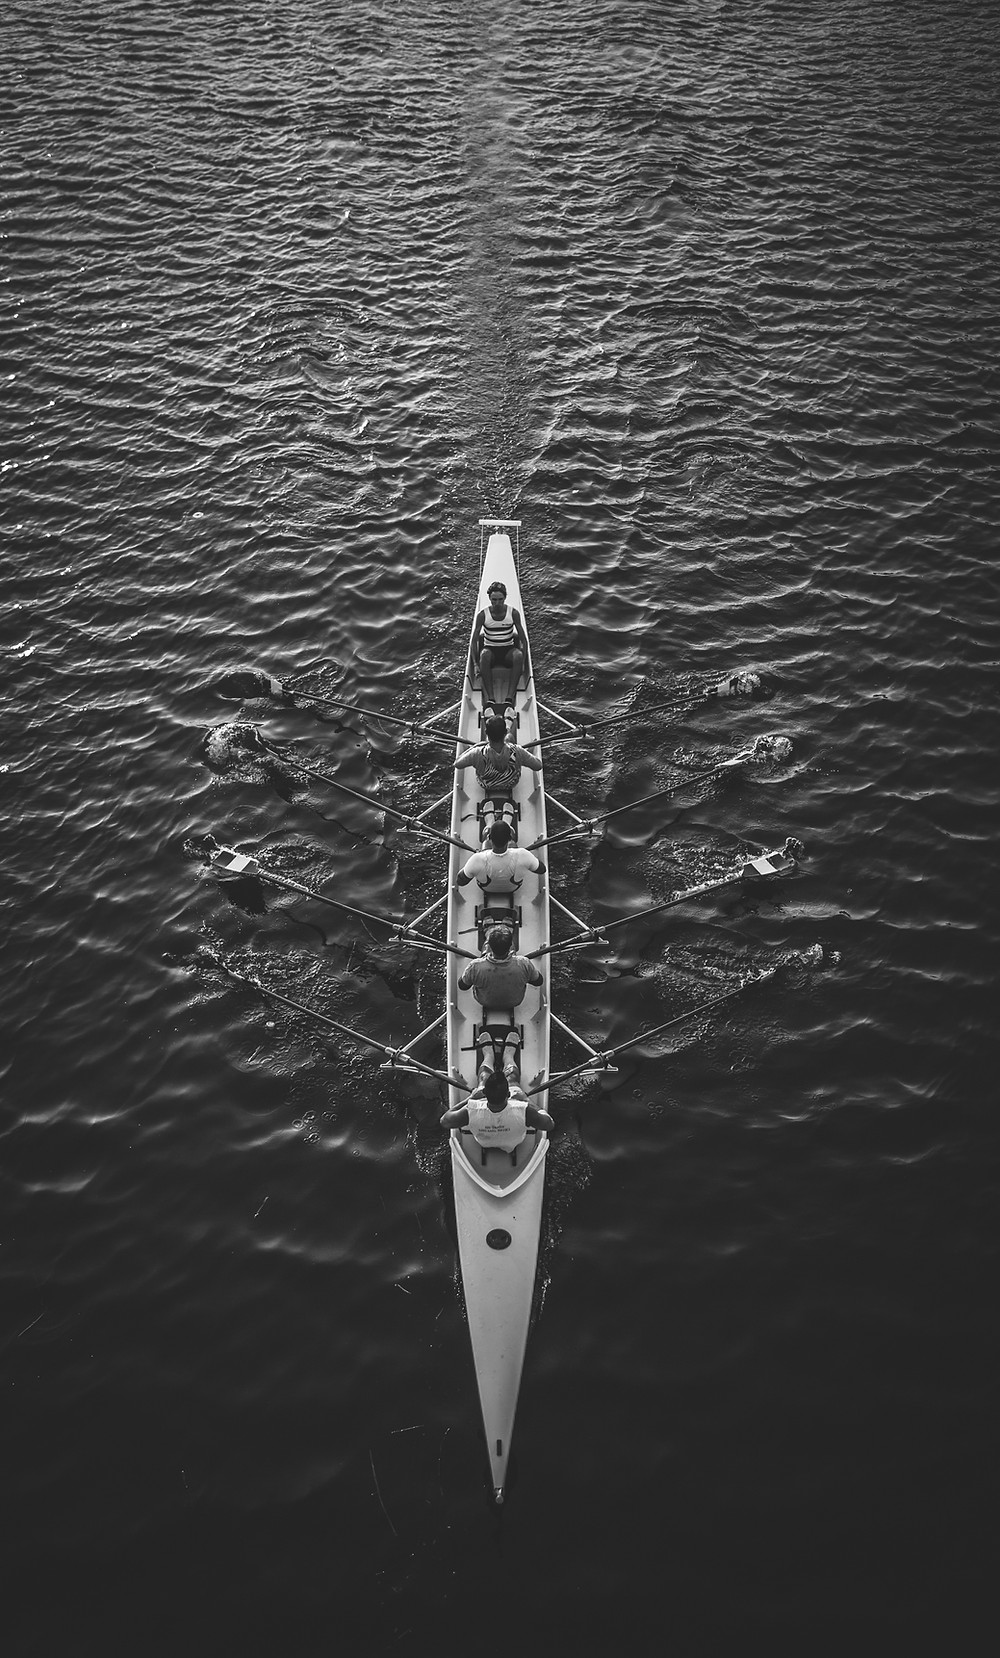 "A team of rowers.     <span>Photo by <a href=""https://unsplash.com/@angelokarabo053?utm_source=unsplash&amp;utm_medium=referral&amp;utm_content=creditCopyText"">Angelo Moleele</a> on <a href=""https://unsplash.com/s/photos/ready?utm_source=unsplash&amp;utm_medium=referral&amp;utm_content=creditCopyText"">Unsplash</a></span>"